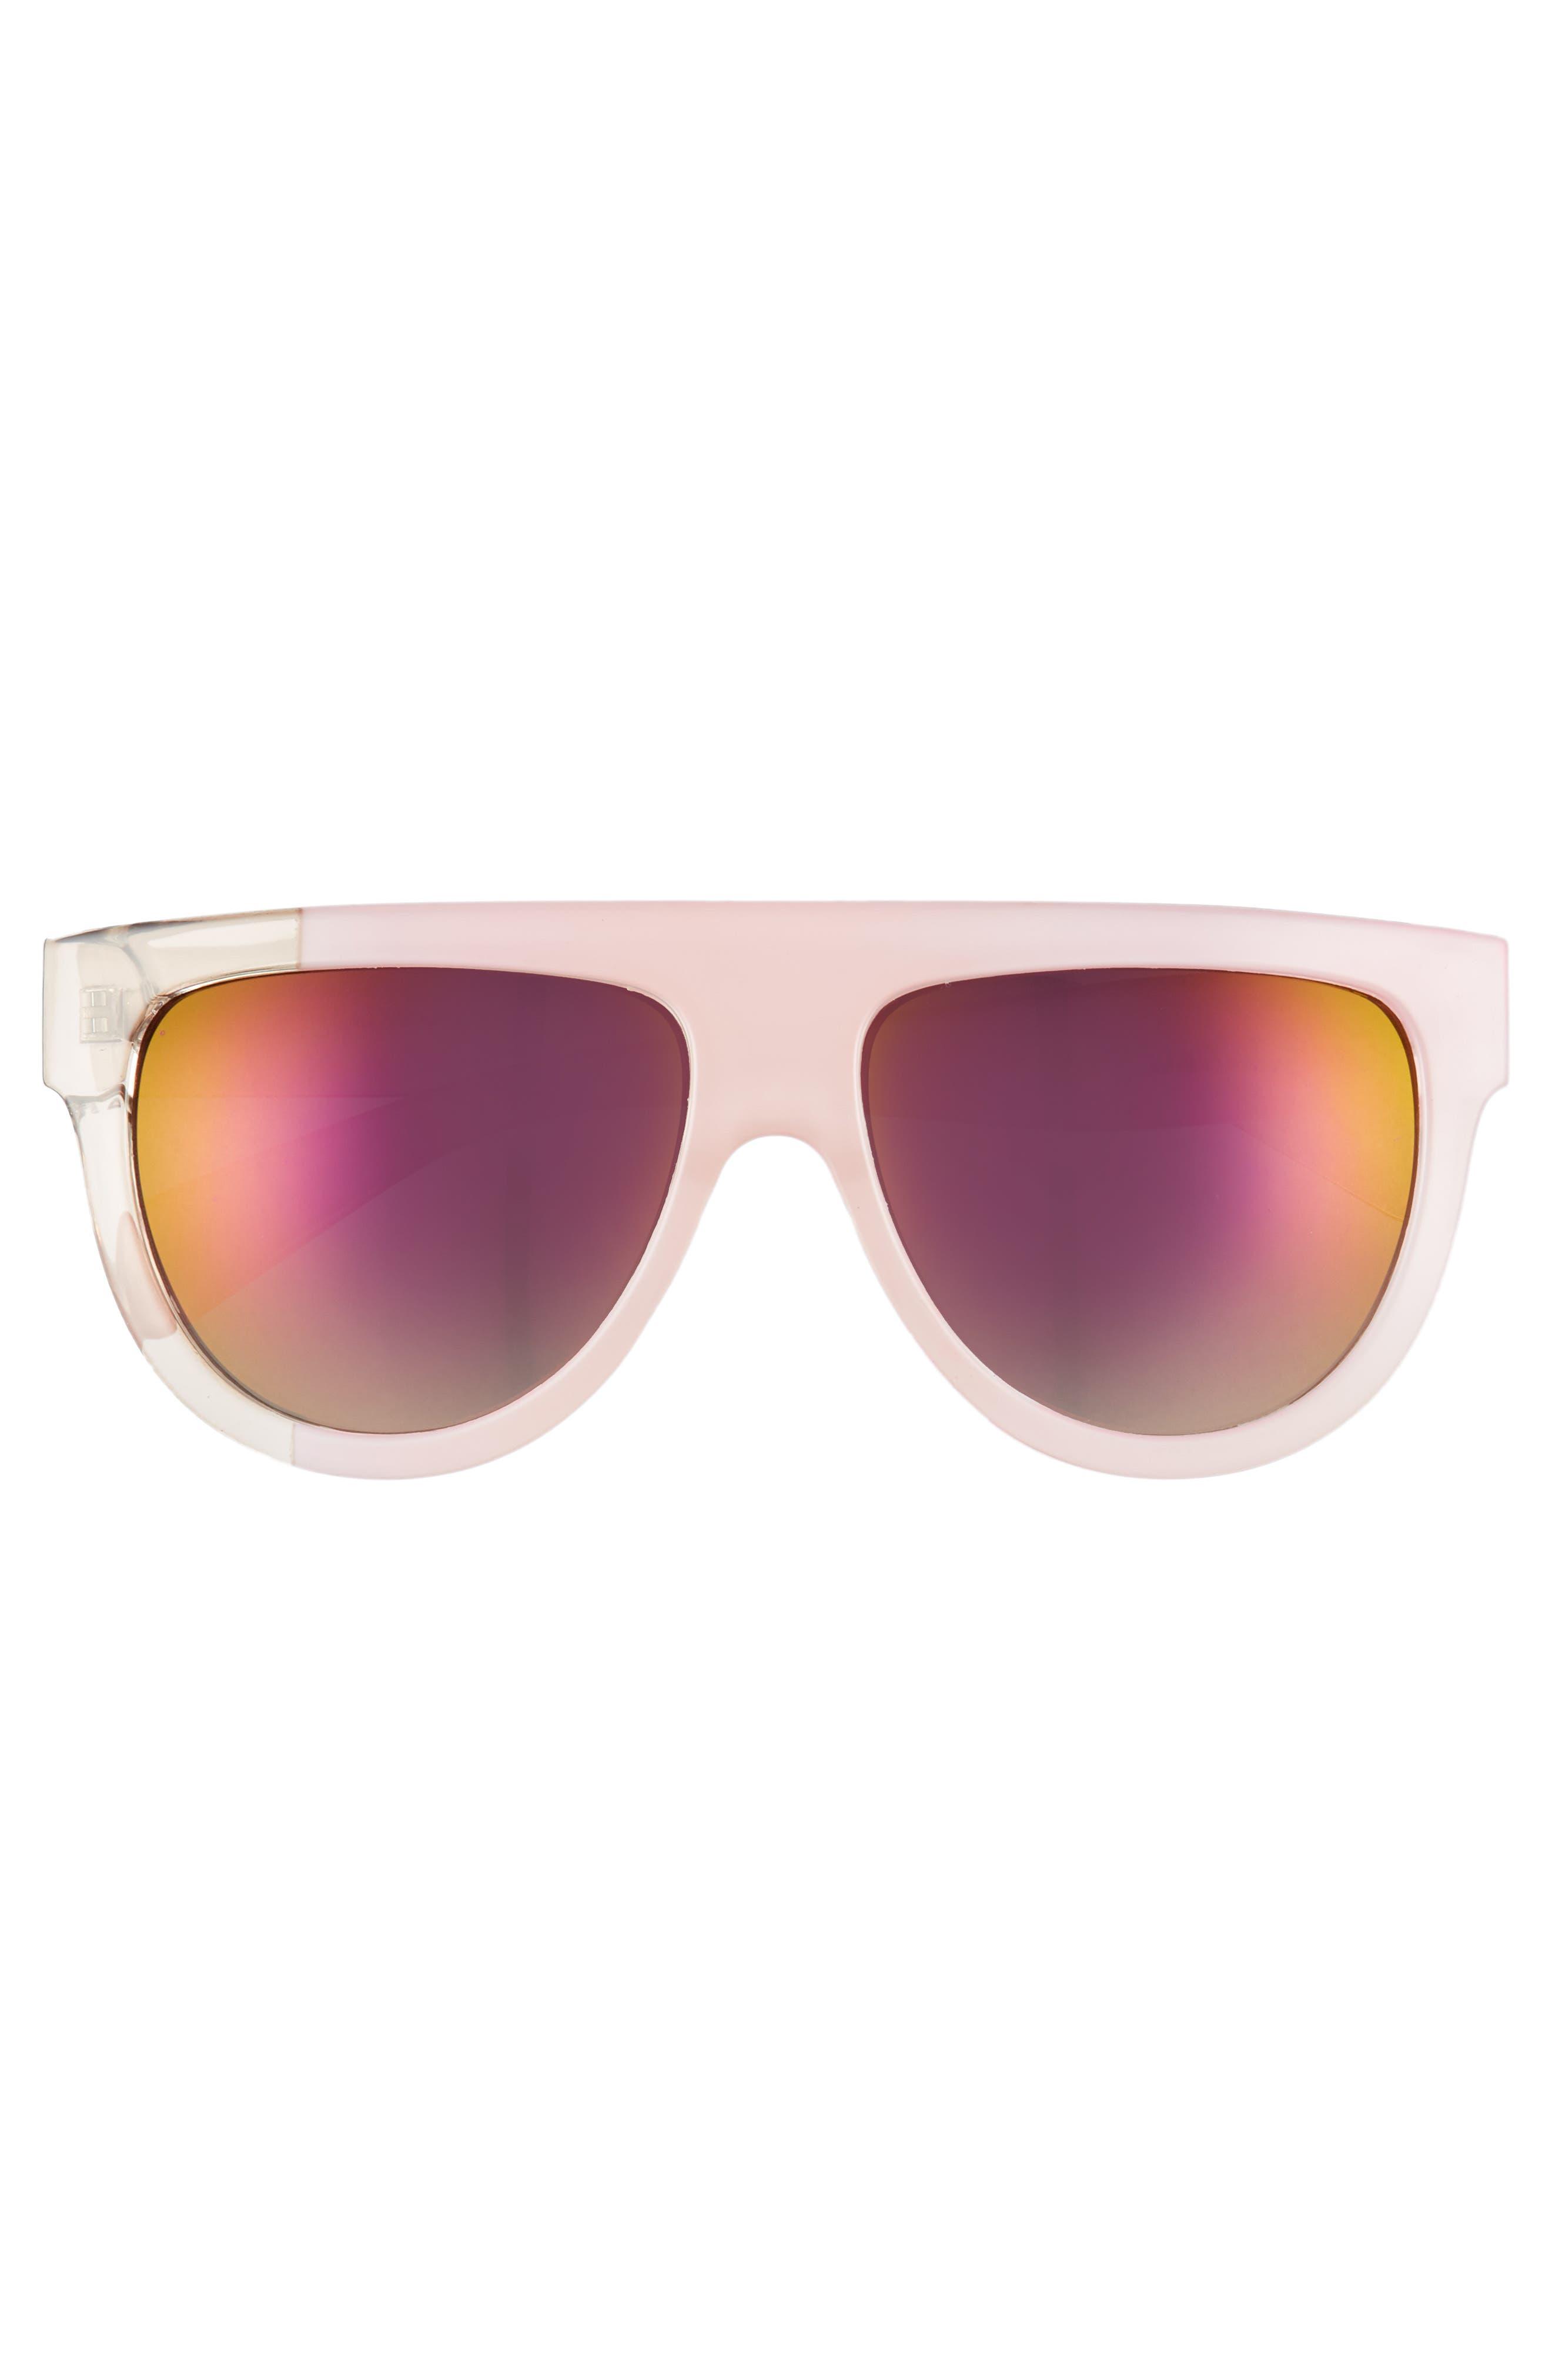 68mm Flat Top Sunglasses,                             Alternate thumbnail 6, color,